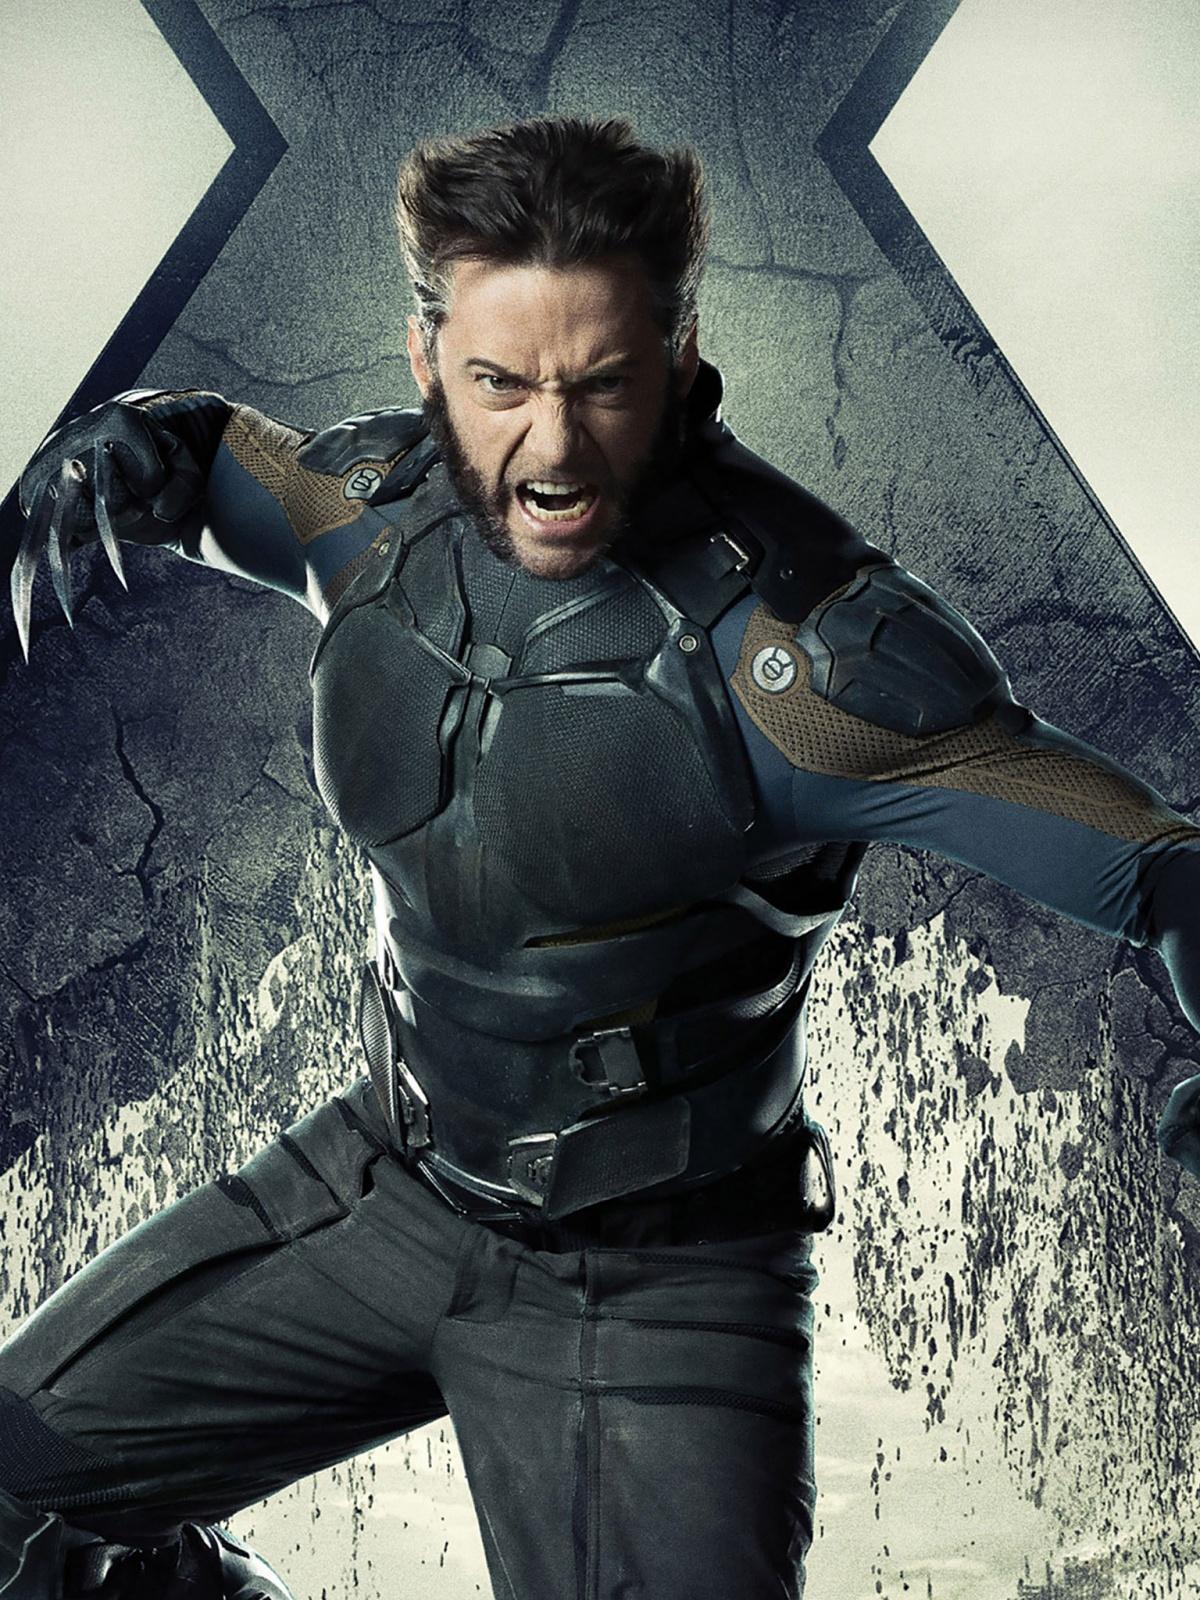 Hugh Jackman X Men Wolverine 1200x1600 Wallpaper Teahub Io